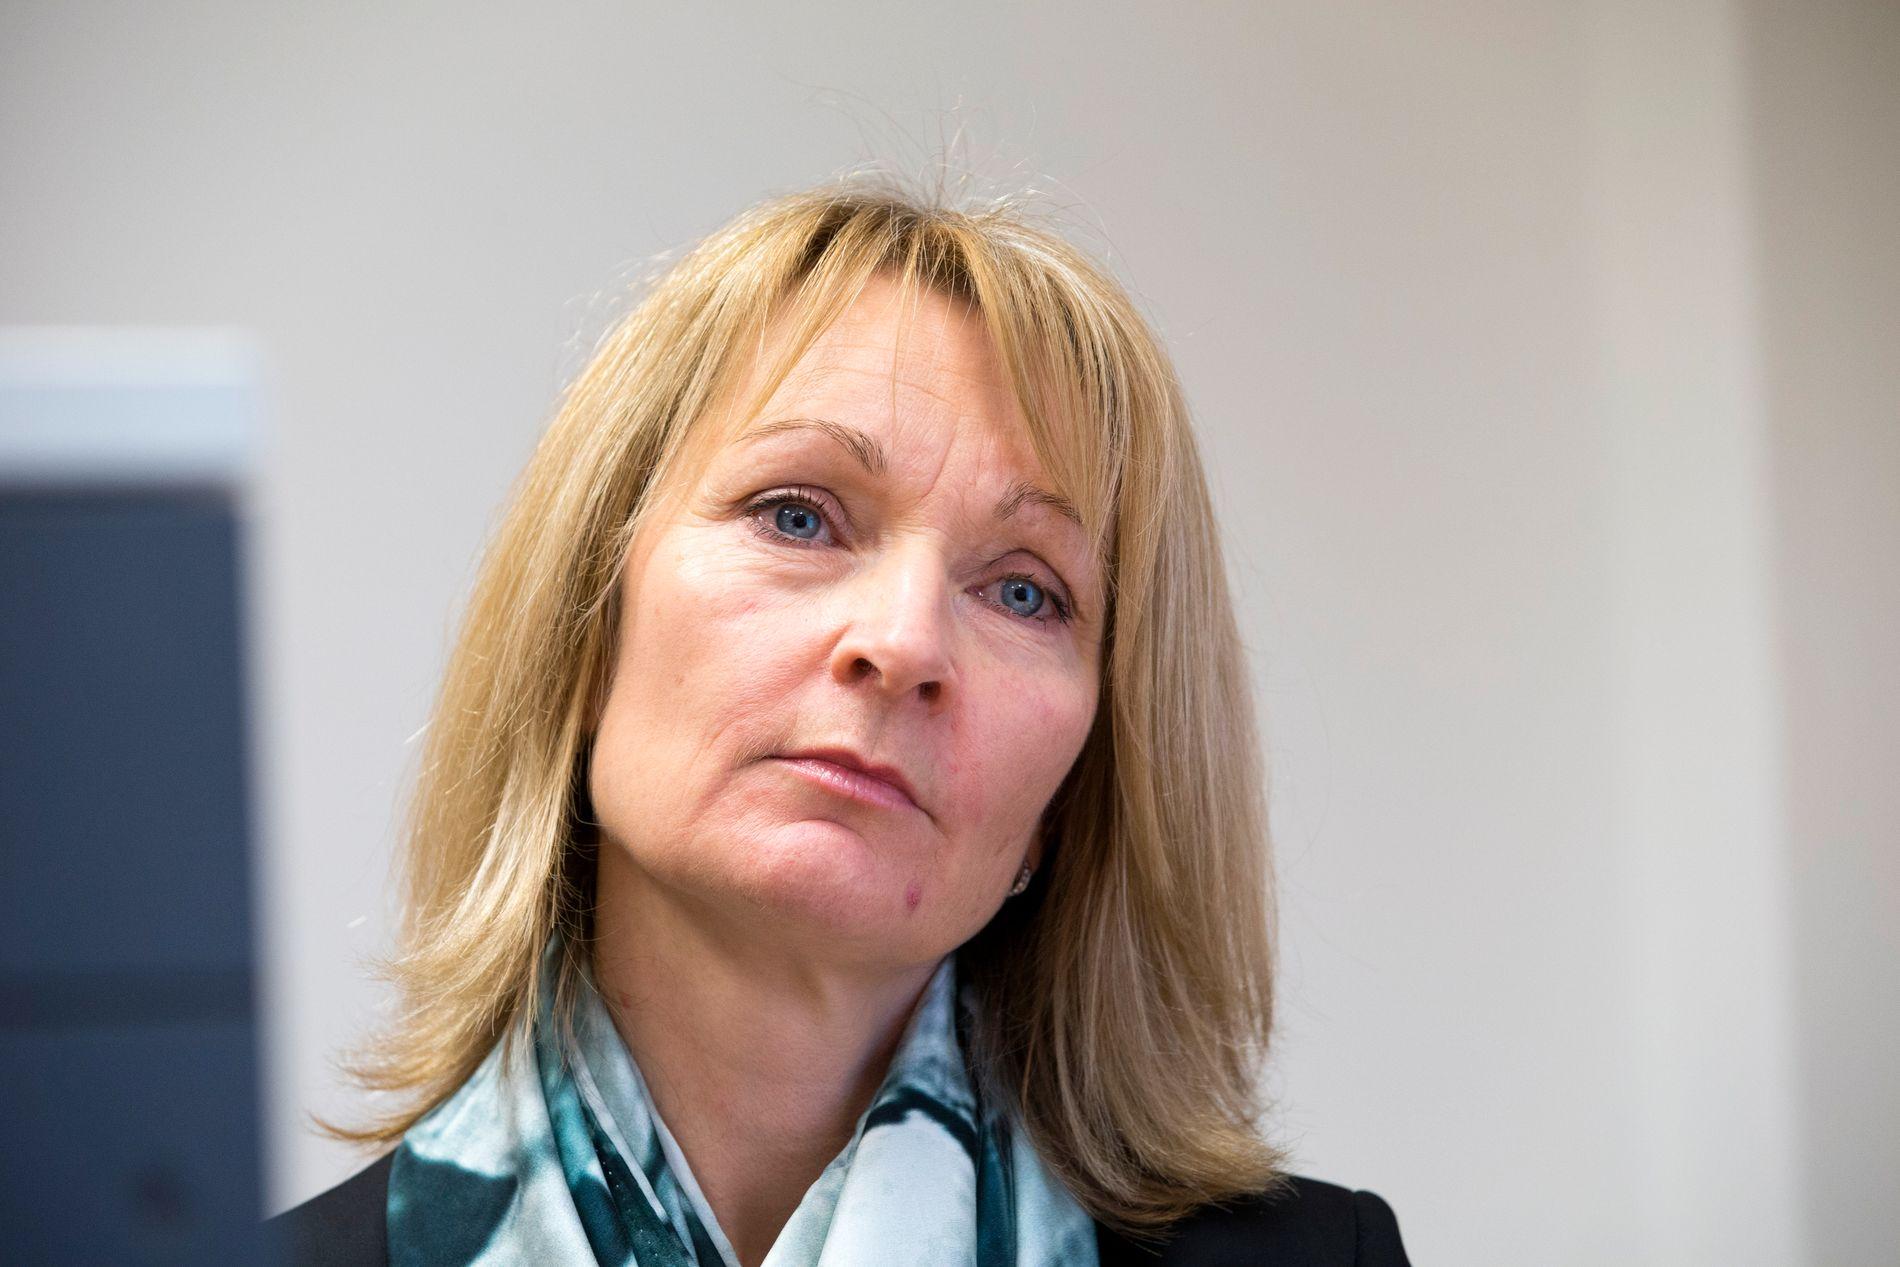 POLITIADVOKAT: Hilde Strand i Oslo politidistrikt er politiadvokat på saken.